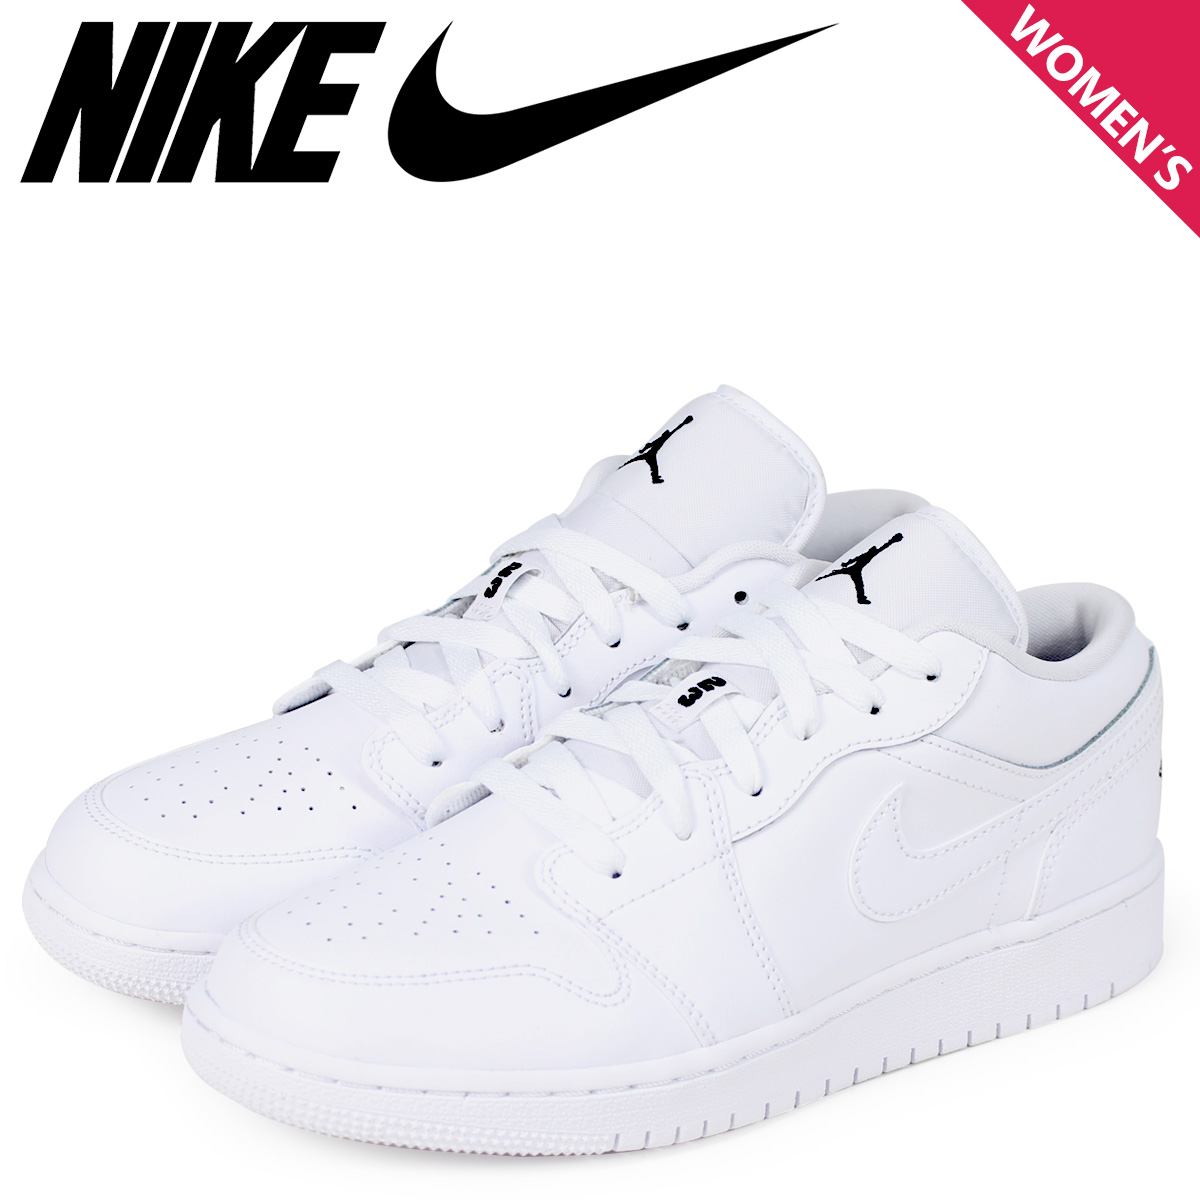 huge selection of 9e23a 2b0d5 NIKE Nike Air Jordan 1 LOW Lady s sneakers AIR JORDAN 1 BG 553,560-101  shoes white  1 9 Shinnyu load